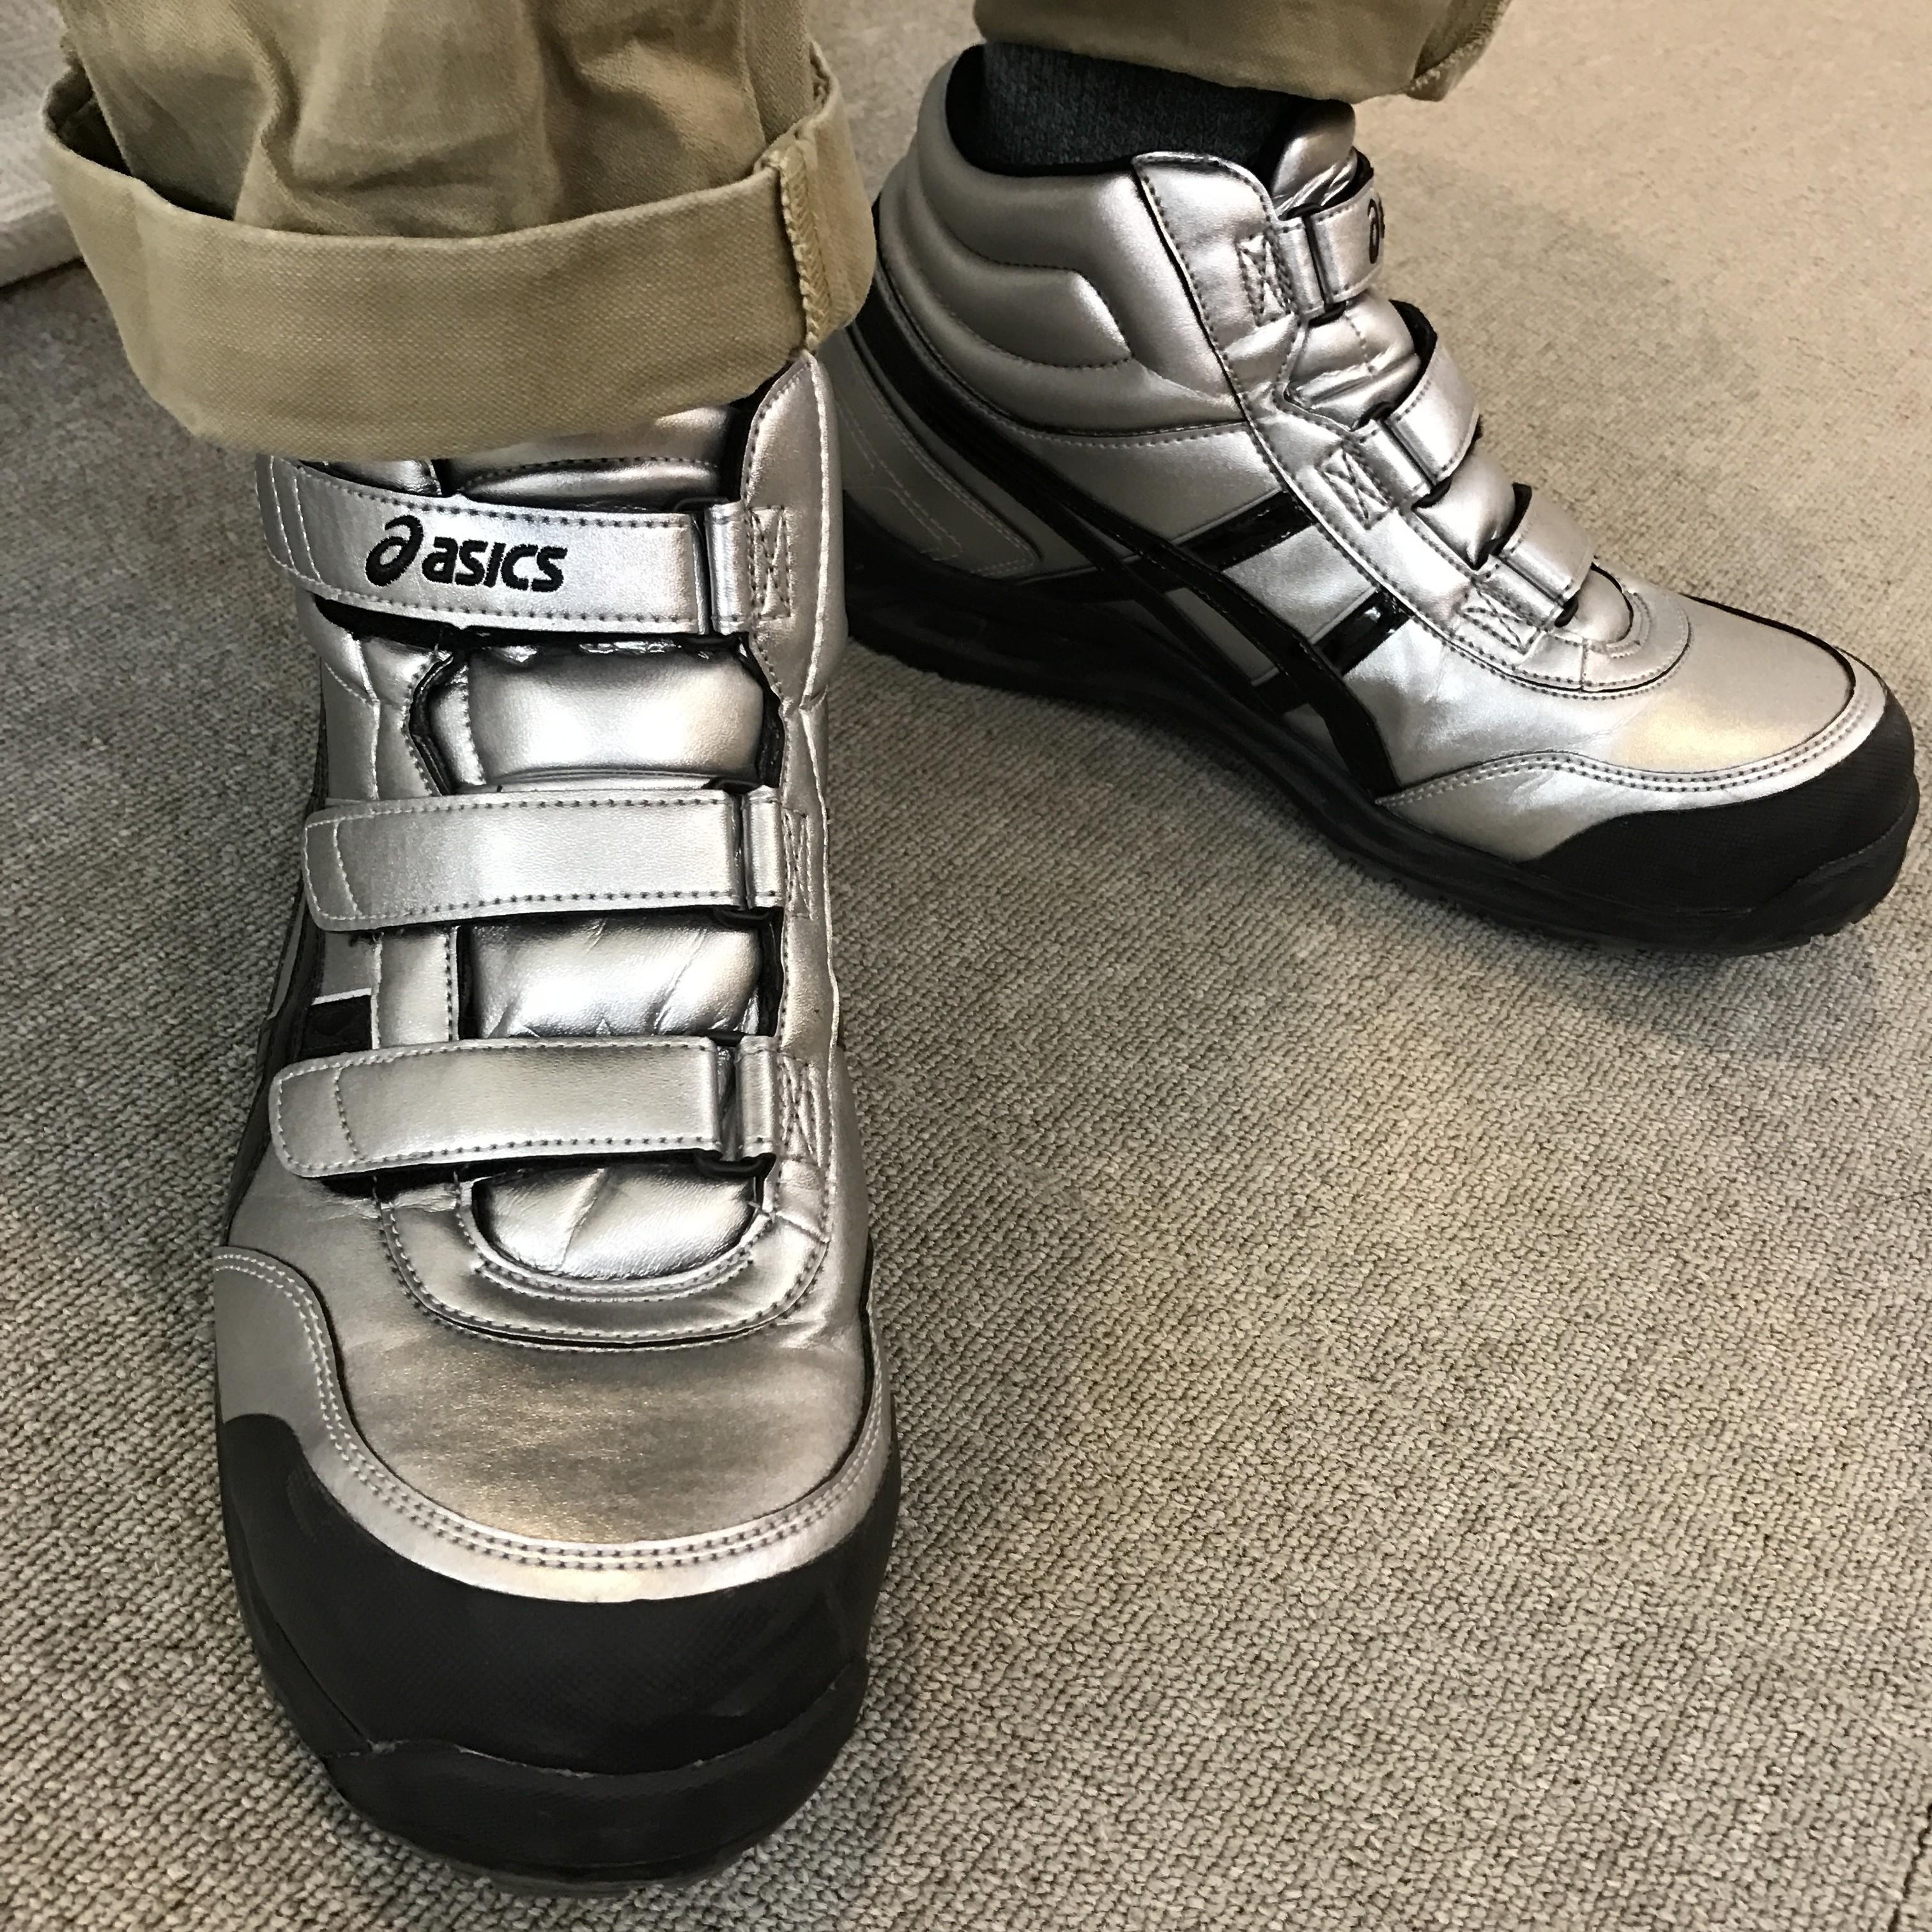 asics|安全靴|アシックス FIS53S/ウィンジョブ53S 限定カラーシルバーブラック